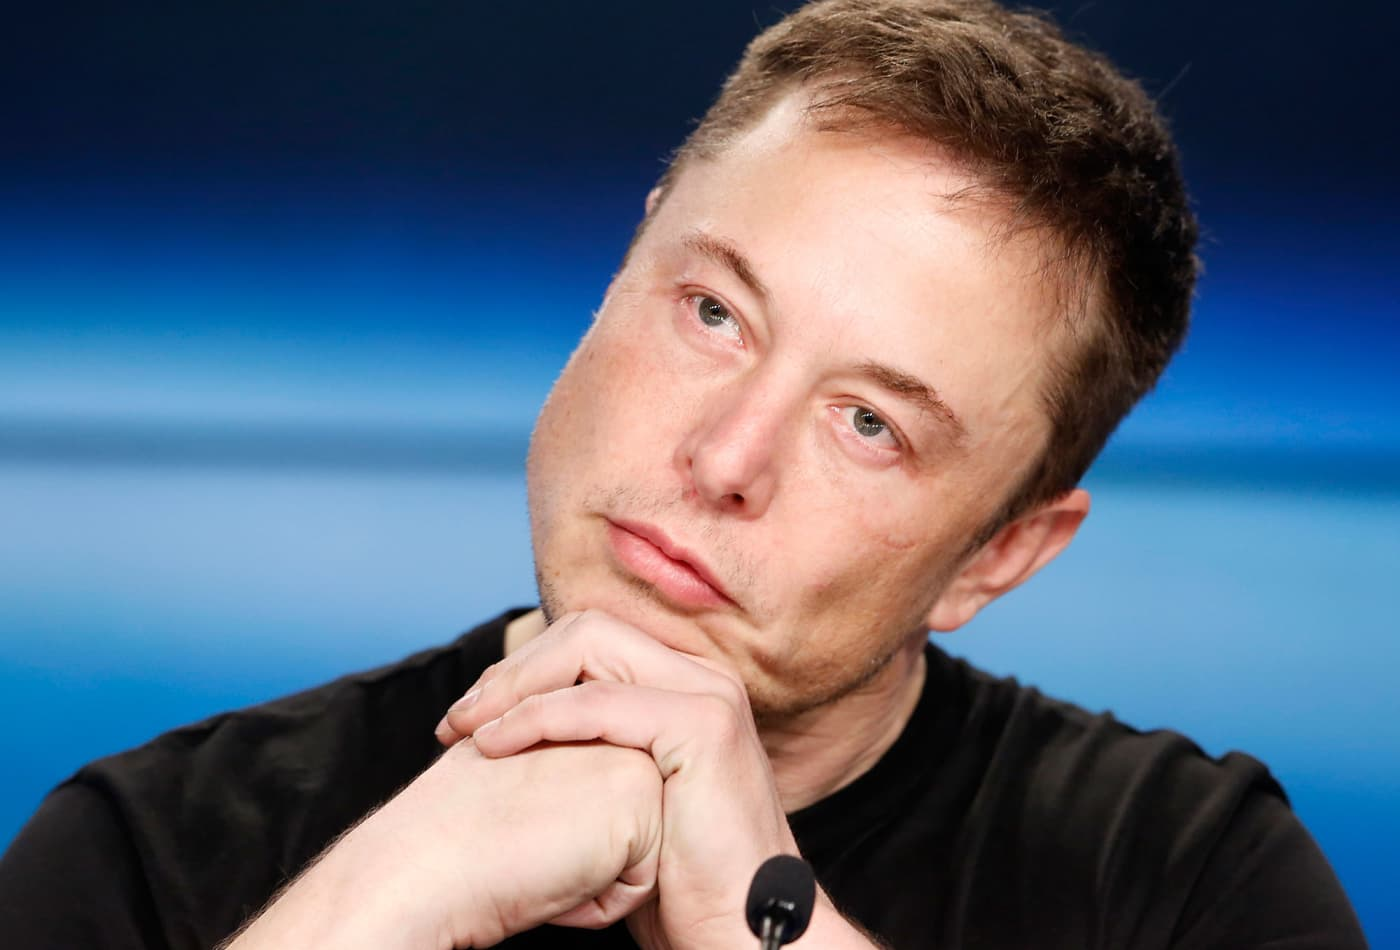 Elon Musk Automated Jobs Could Make Ubi Cash Handouts Necessary